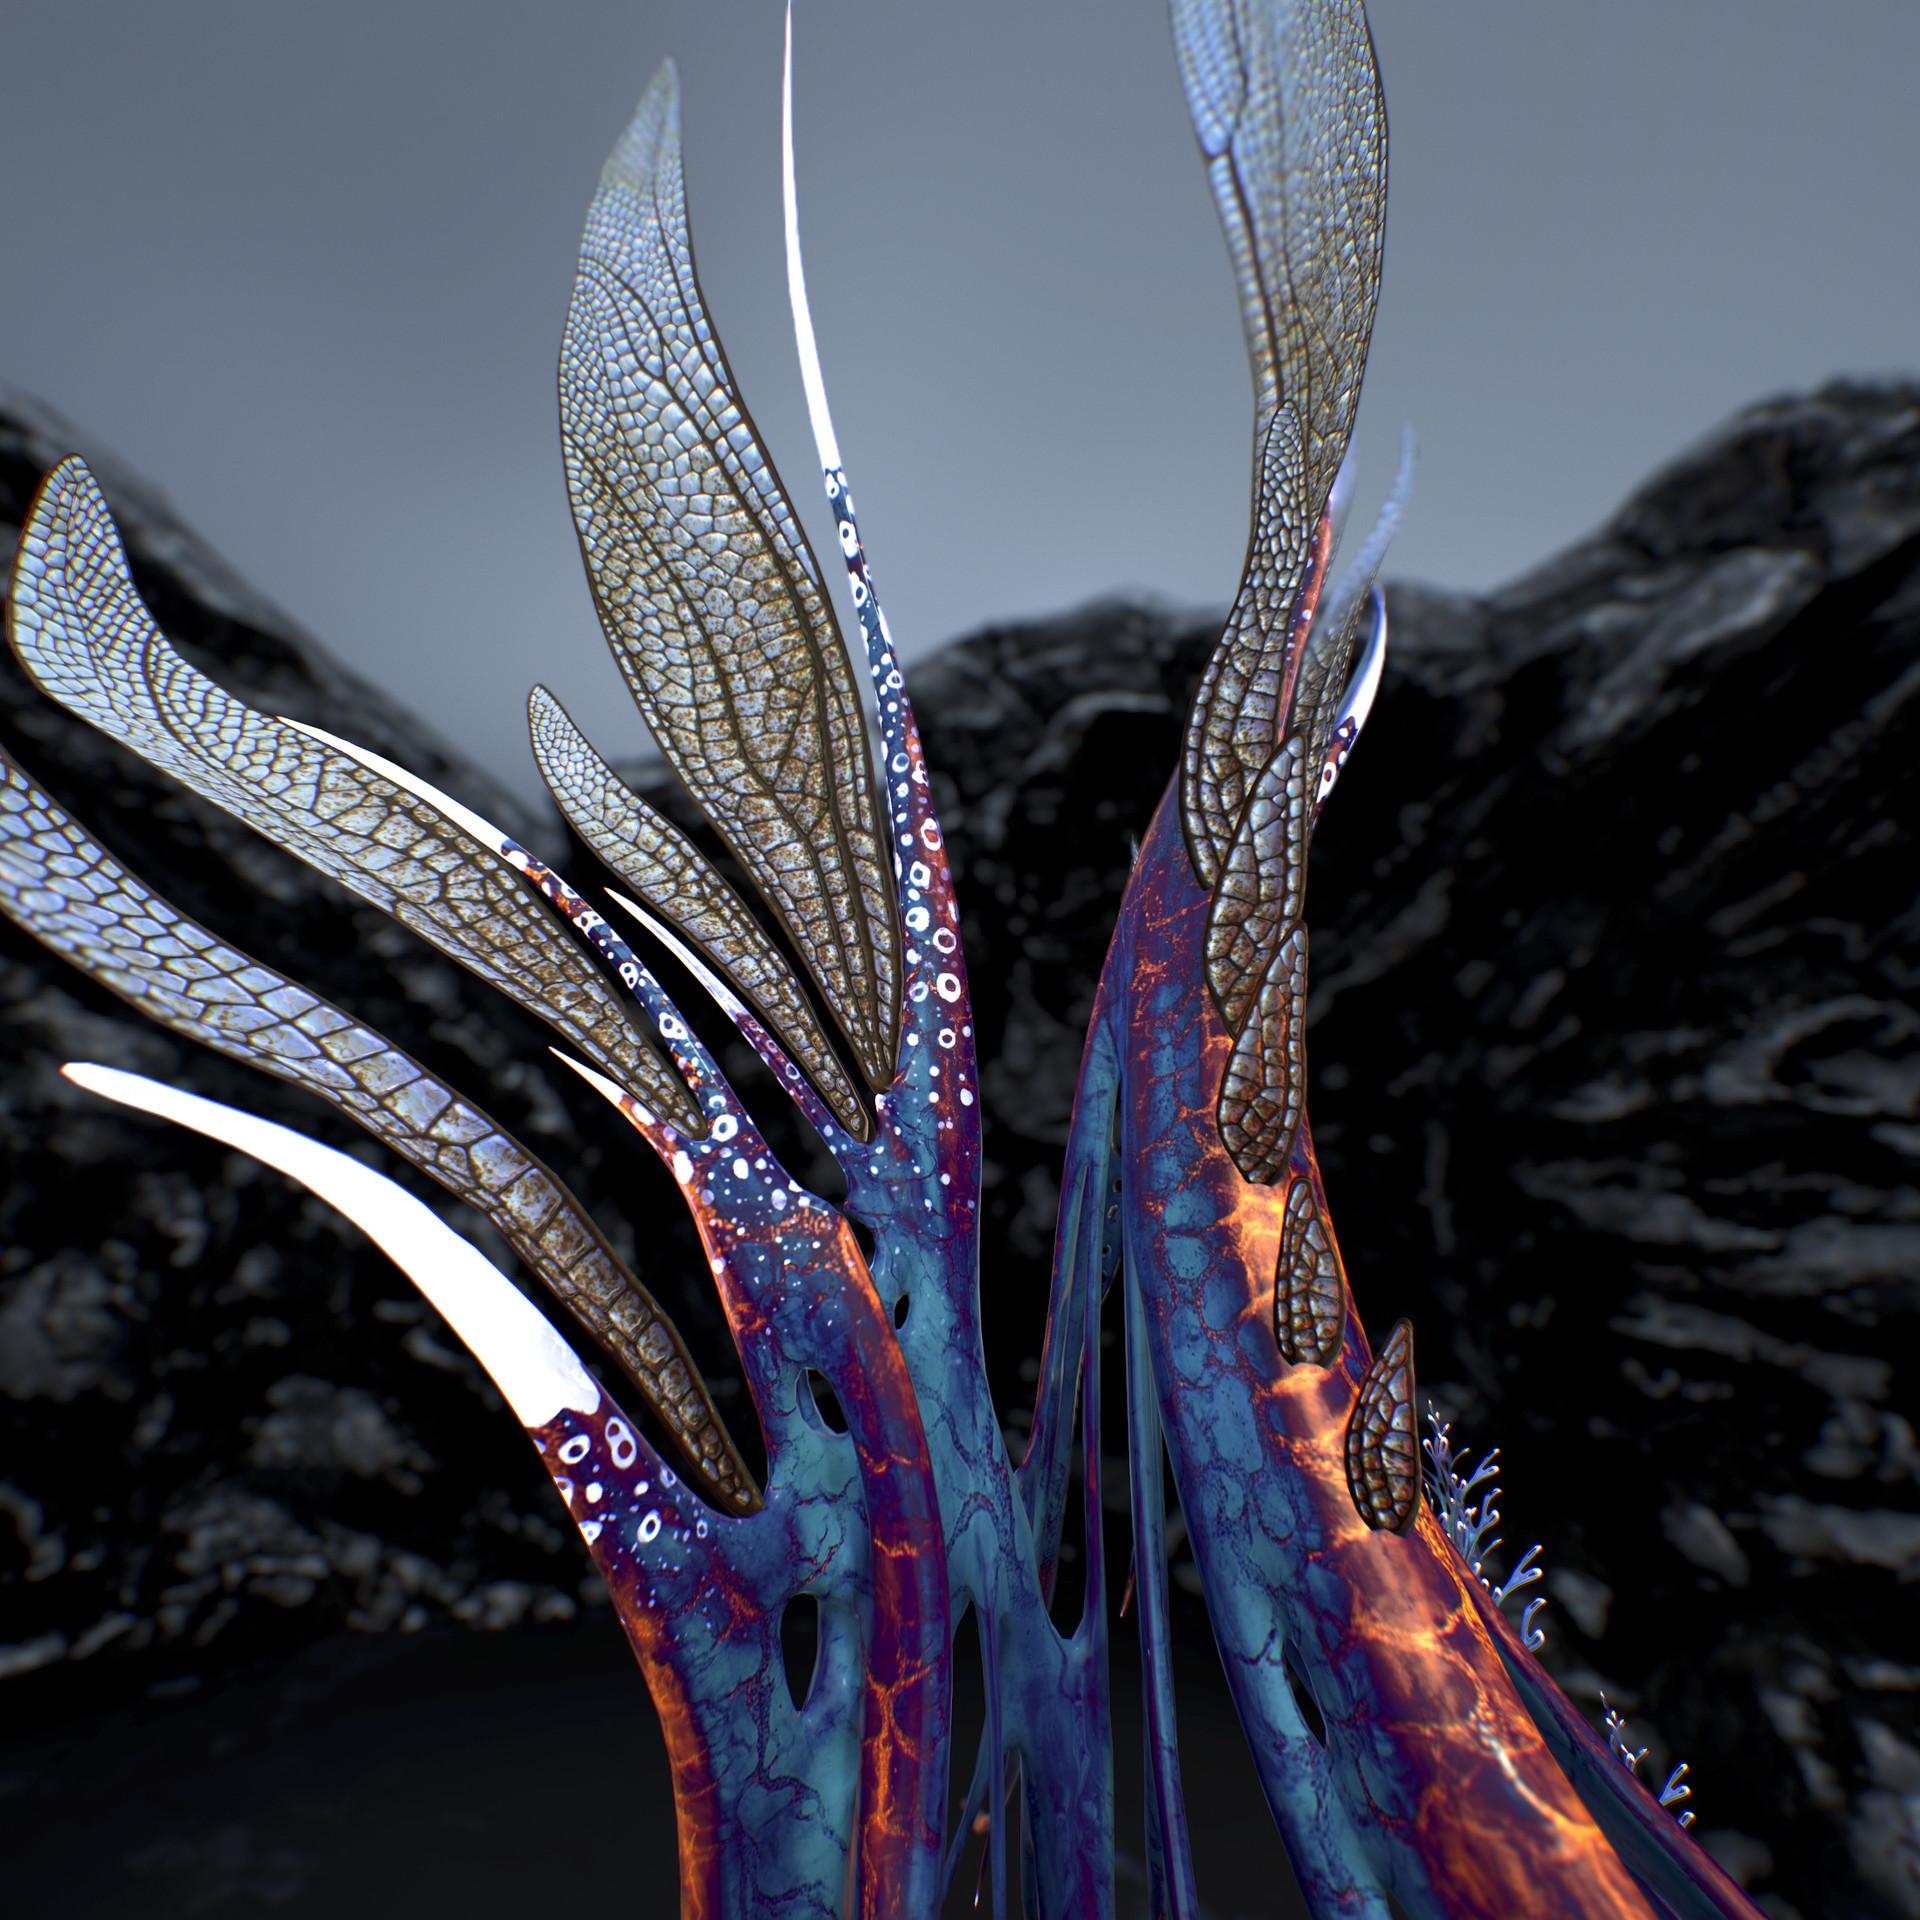 Johan de leenheer alien fern misota spletinus37